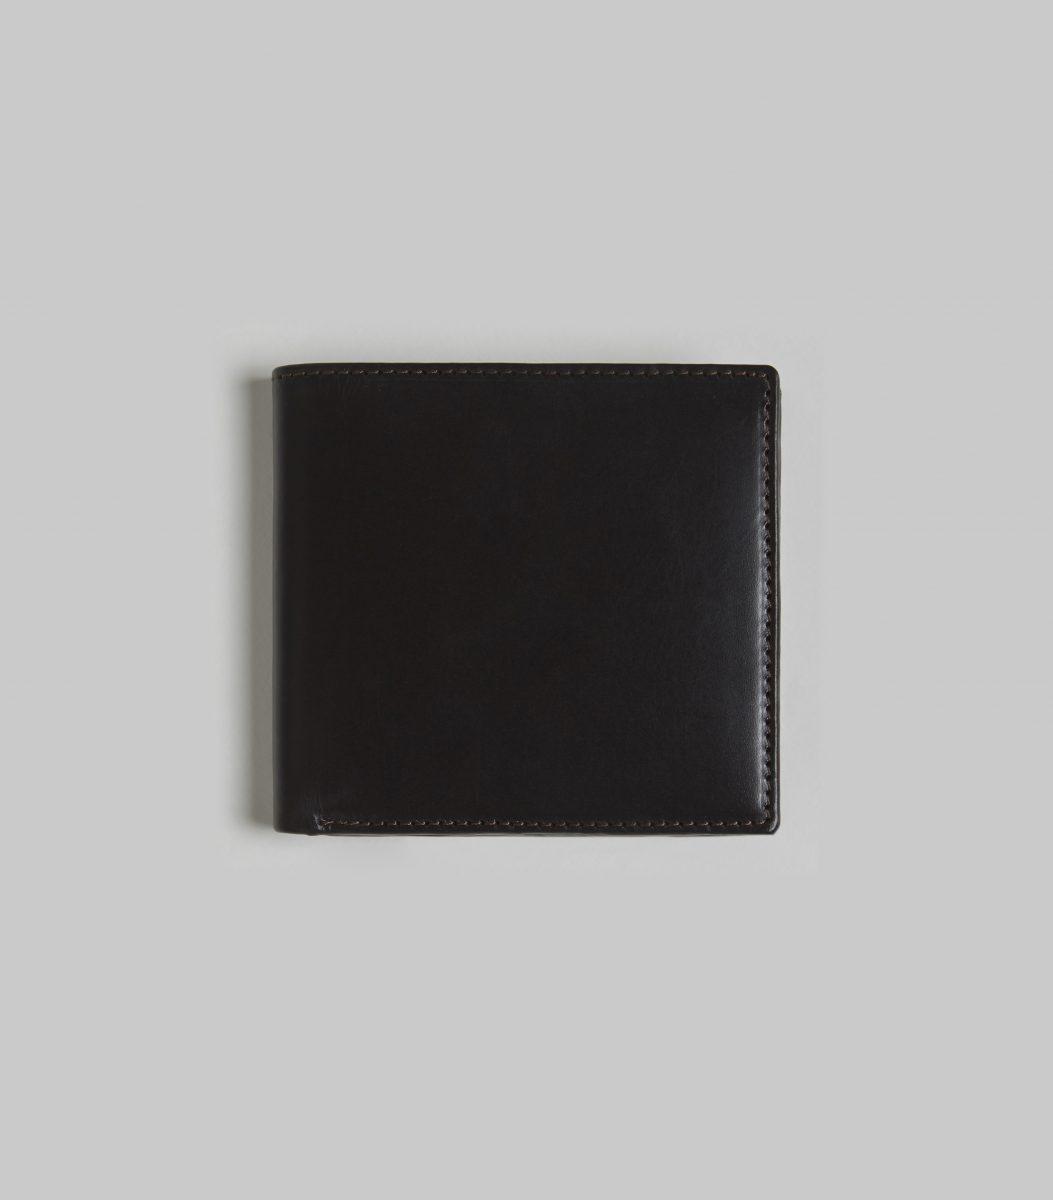 bb3bbfa4067 Havana Bridle 8 CC Billfold Wallet with Huntsman Exclusive Tweed Lining